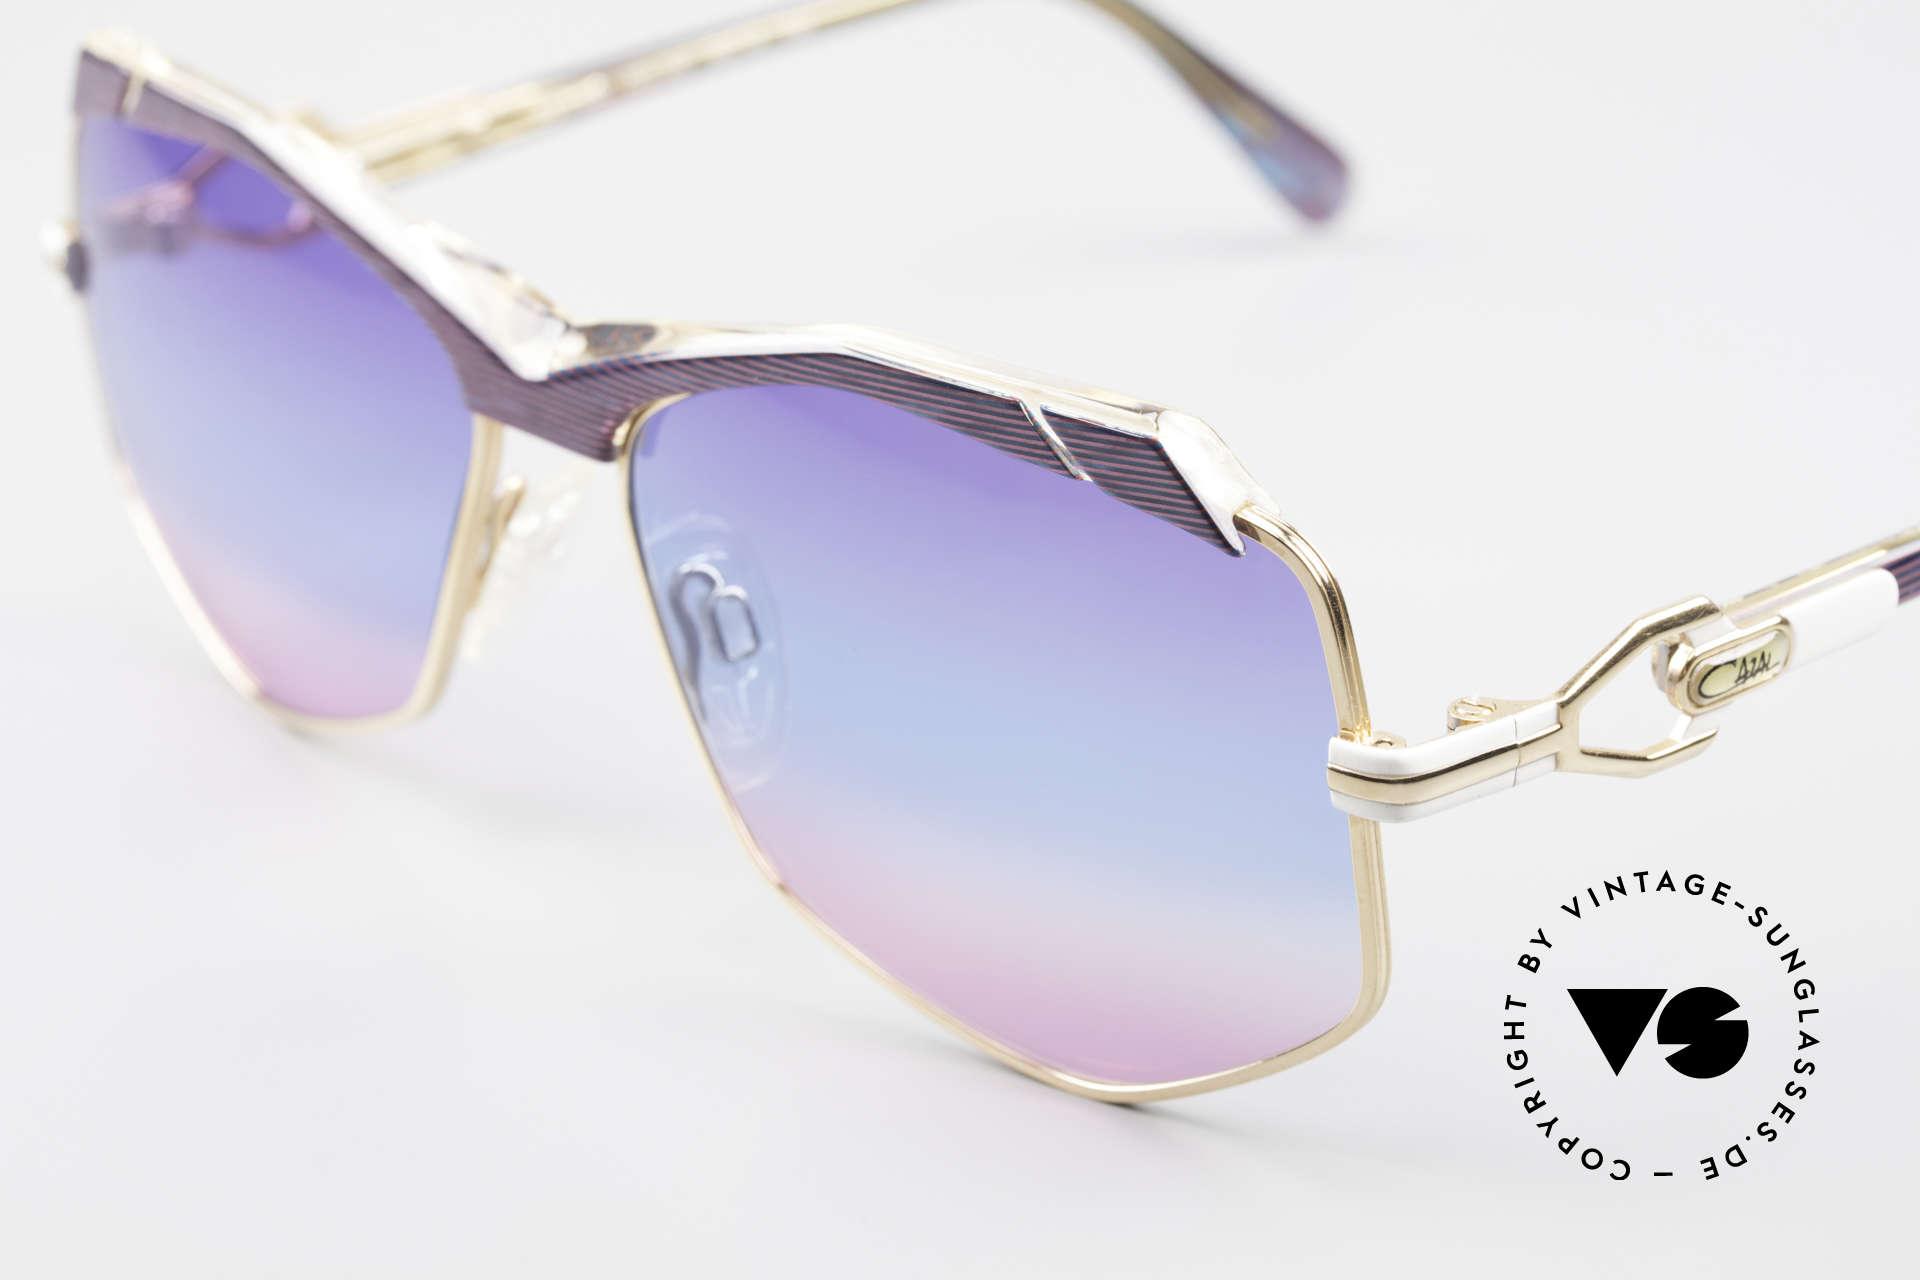 Cazal 230 Bunte Cazal Sonnenbrille 80er, damals Accessoire der amerik. HipHop Szene, Passend für Damen